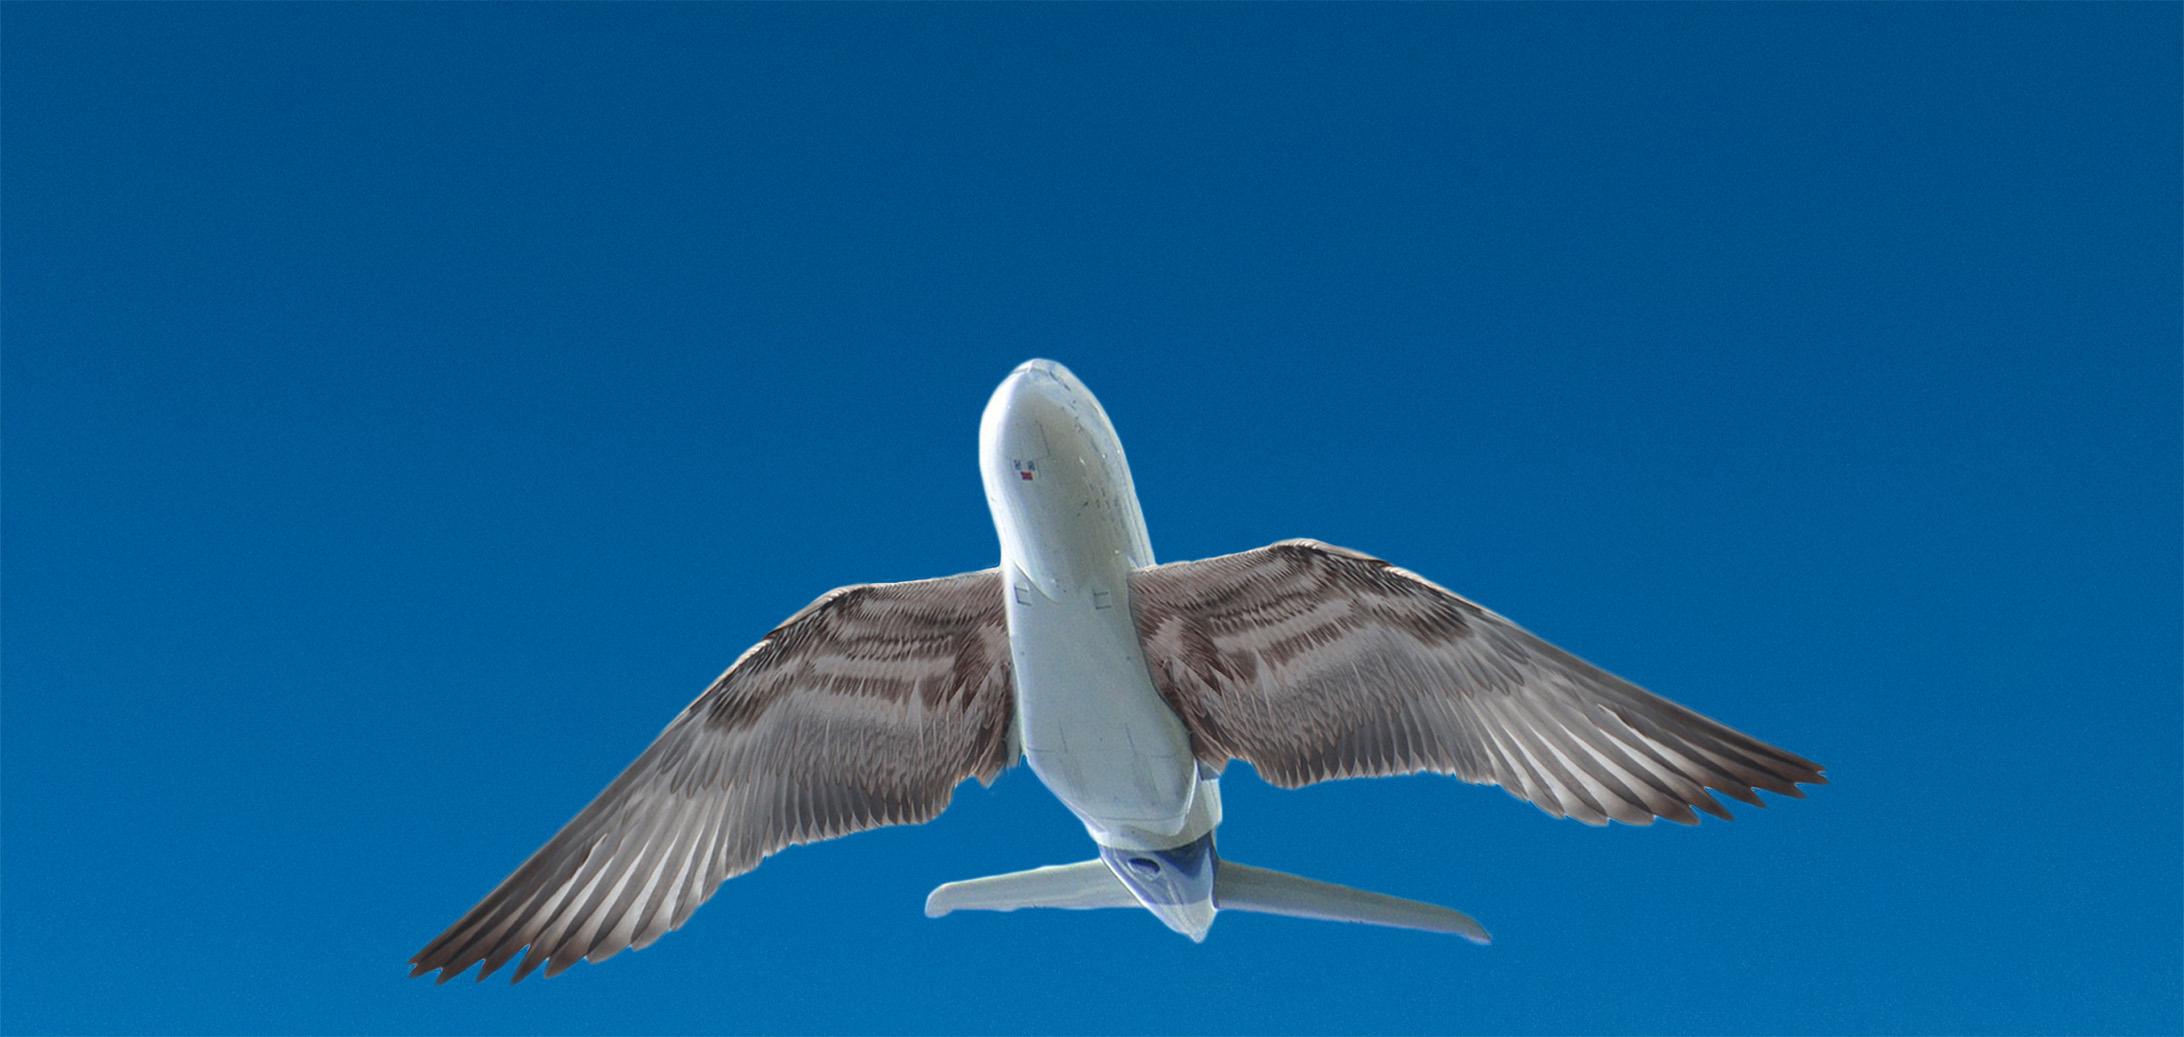 ailes futur avion oiseau